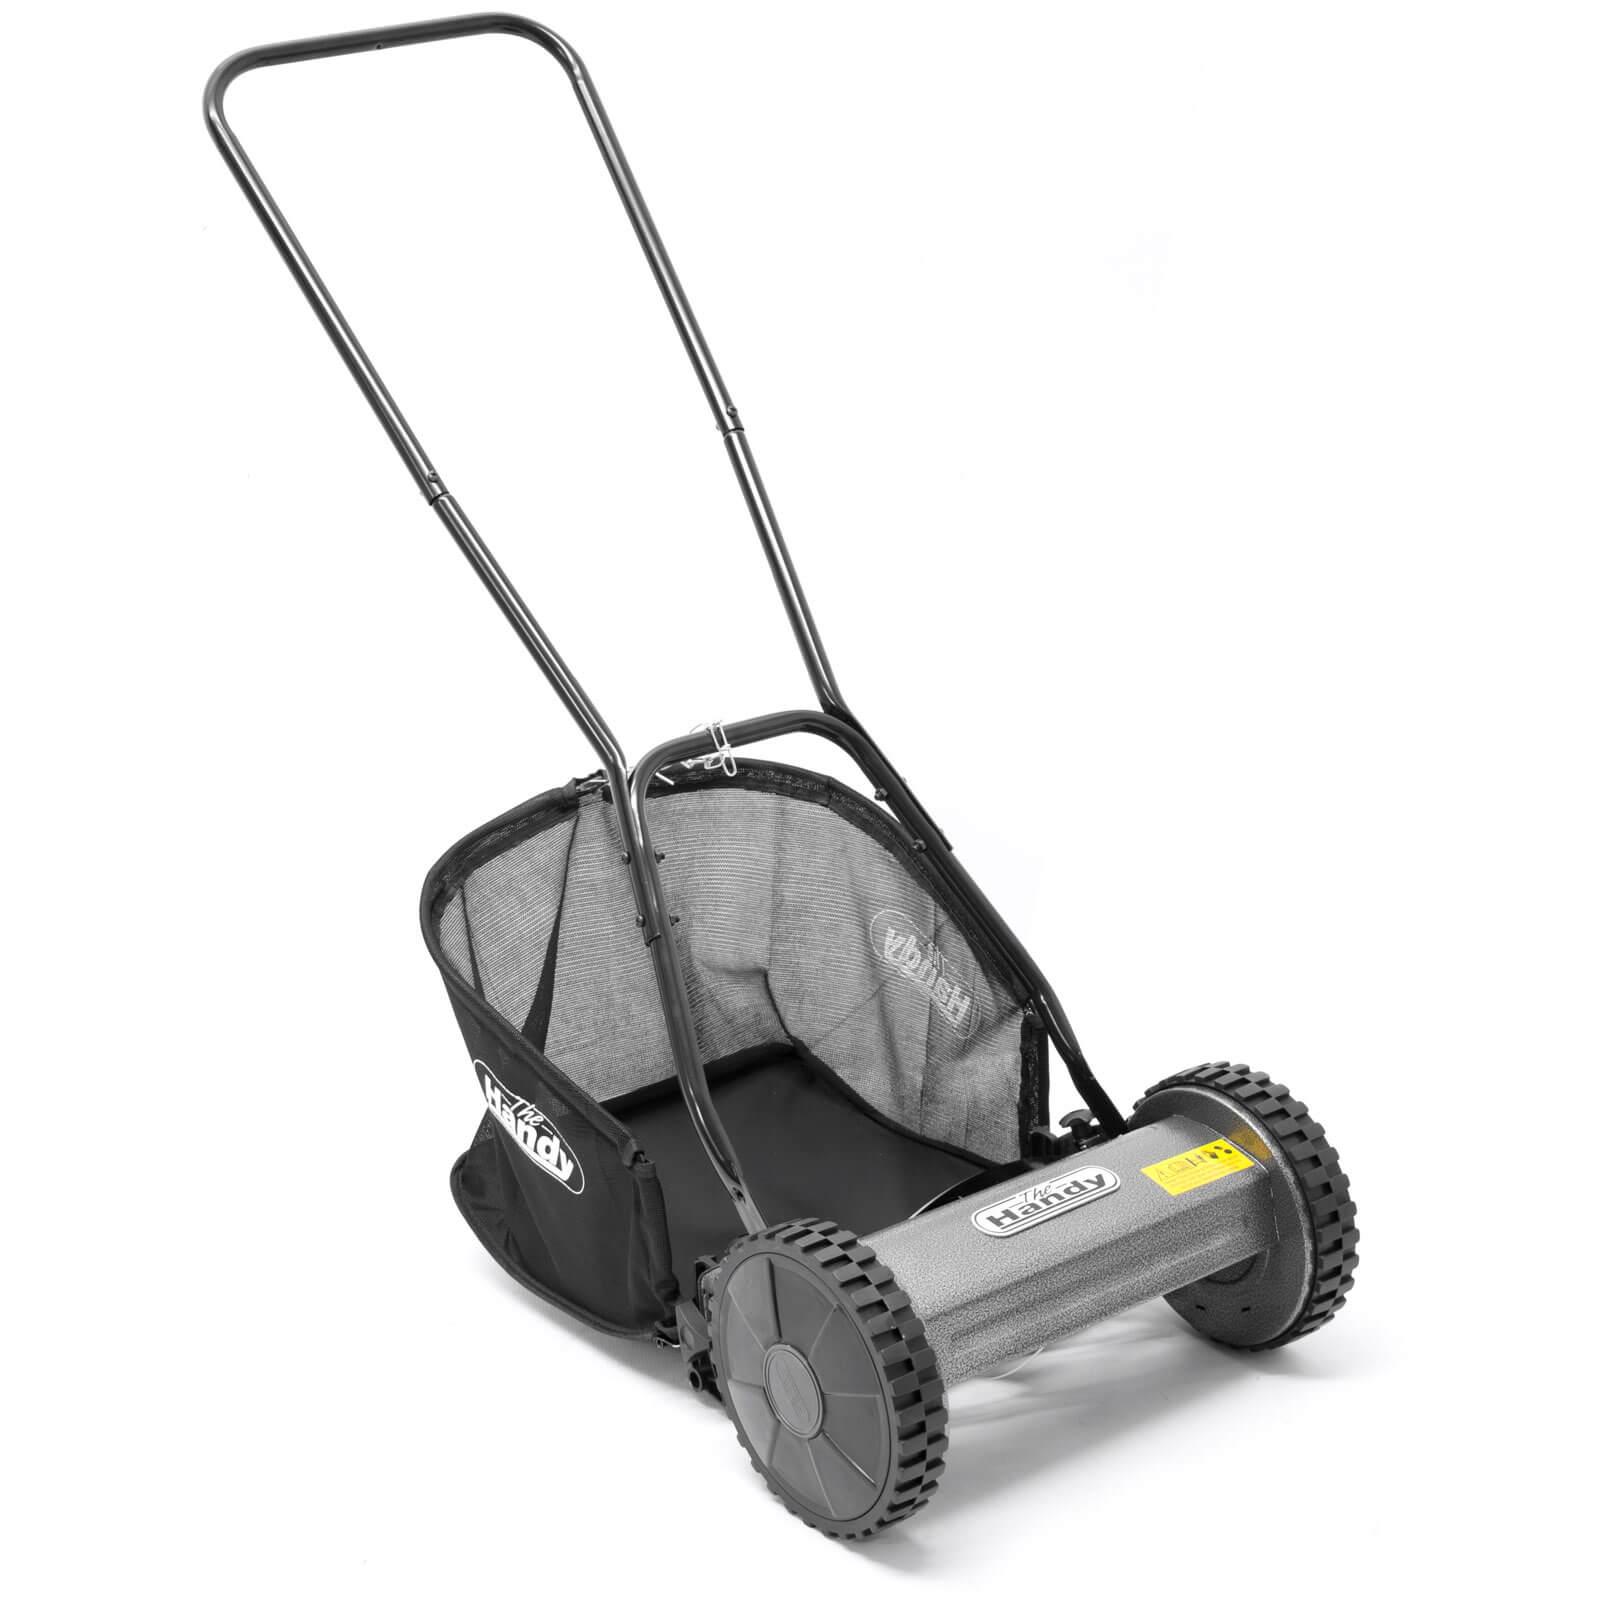 Handy Hand Push Lawn Mower 300mm Cut Width